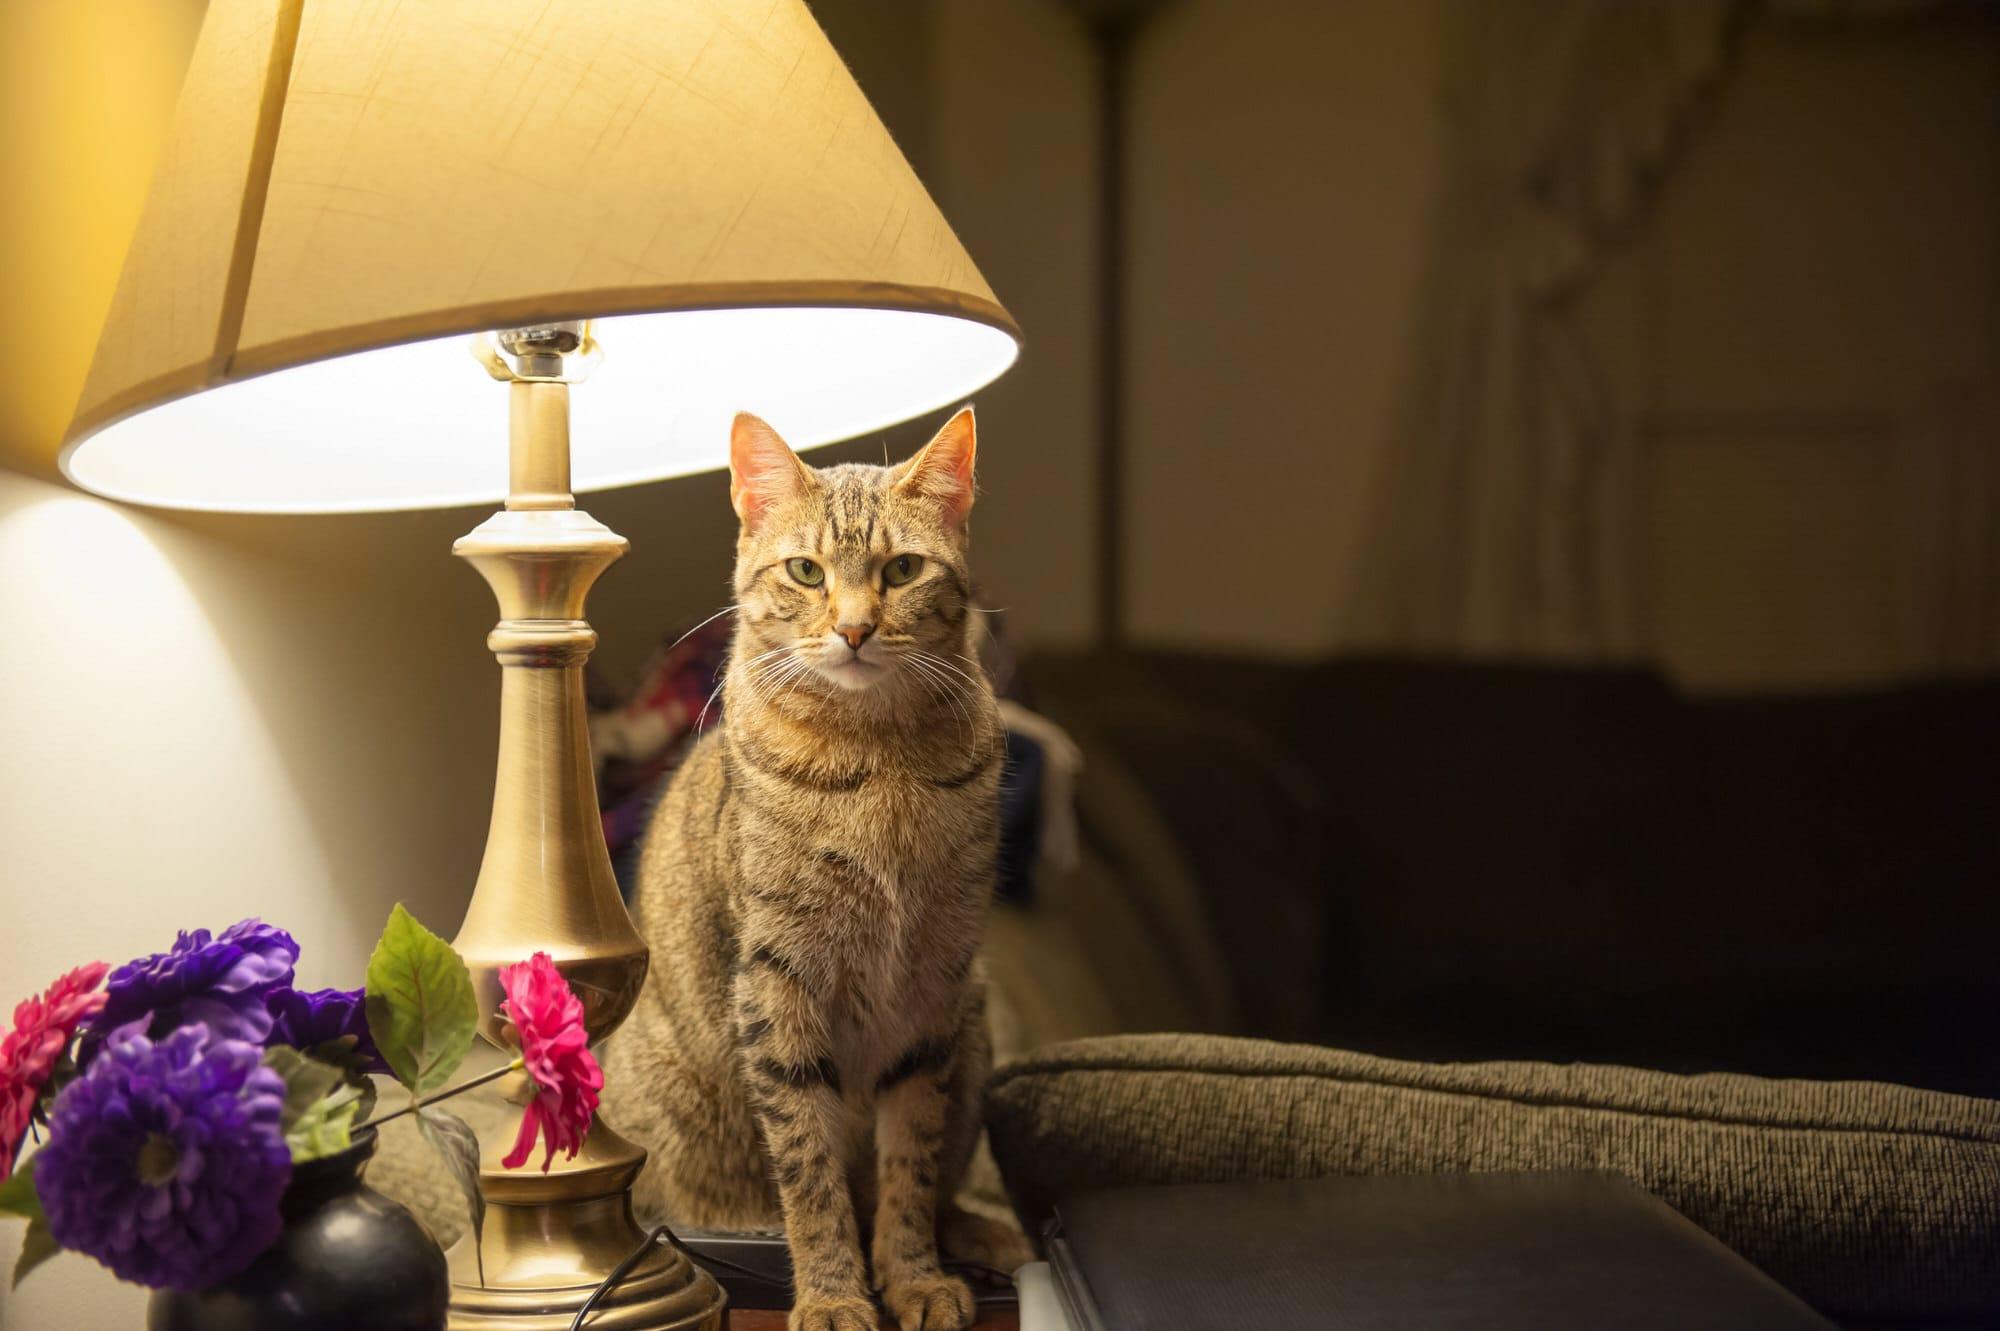 Katze miaut nachts